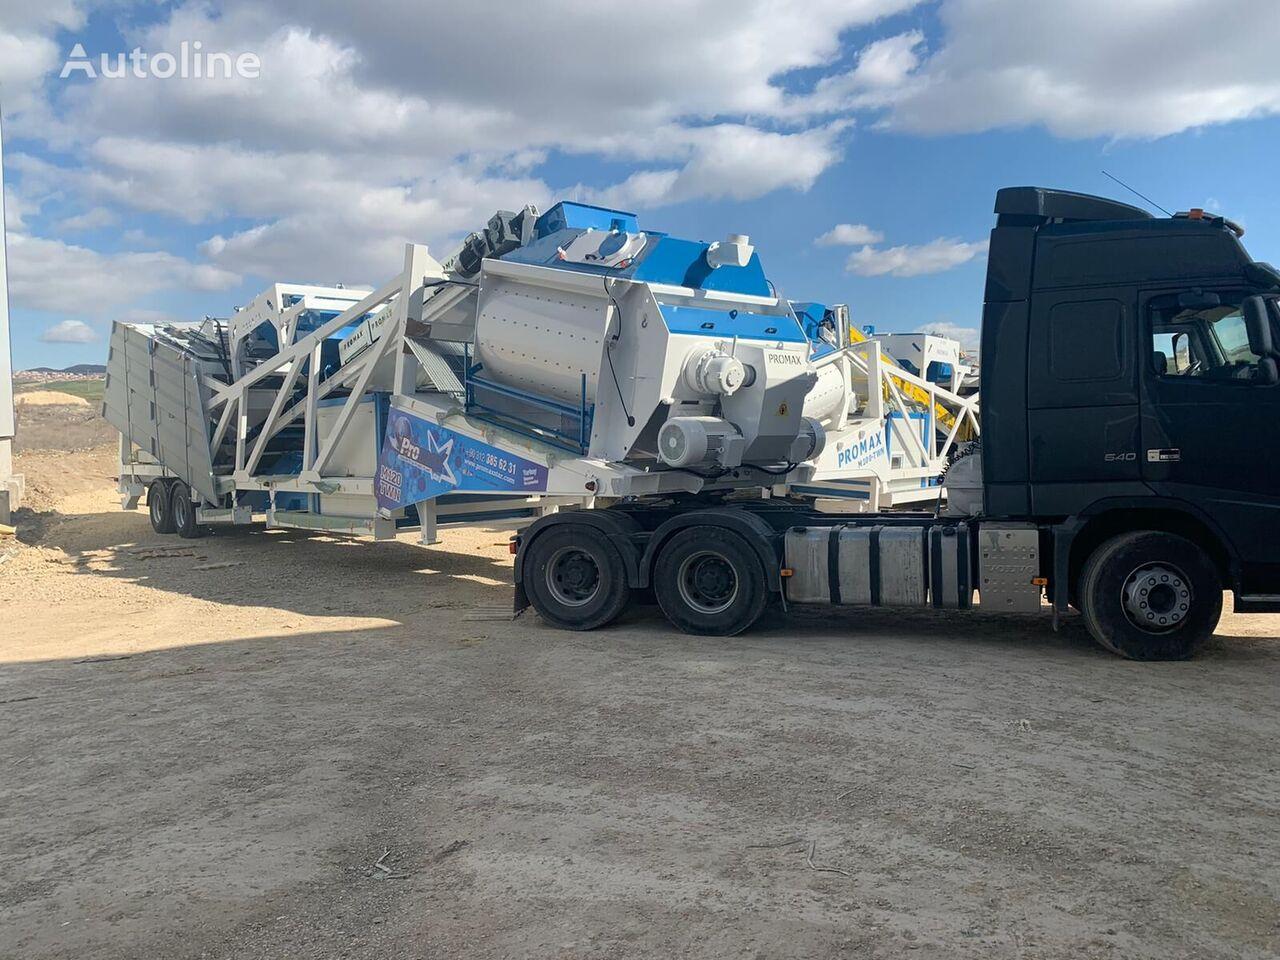 central de betão PROMAX Mobile Concrete Batching Plant M120-TWN (120m3/h) novo